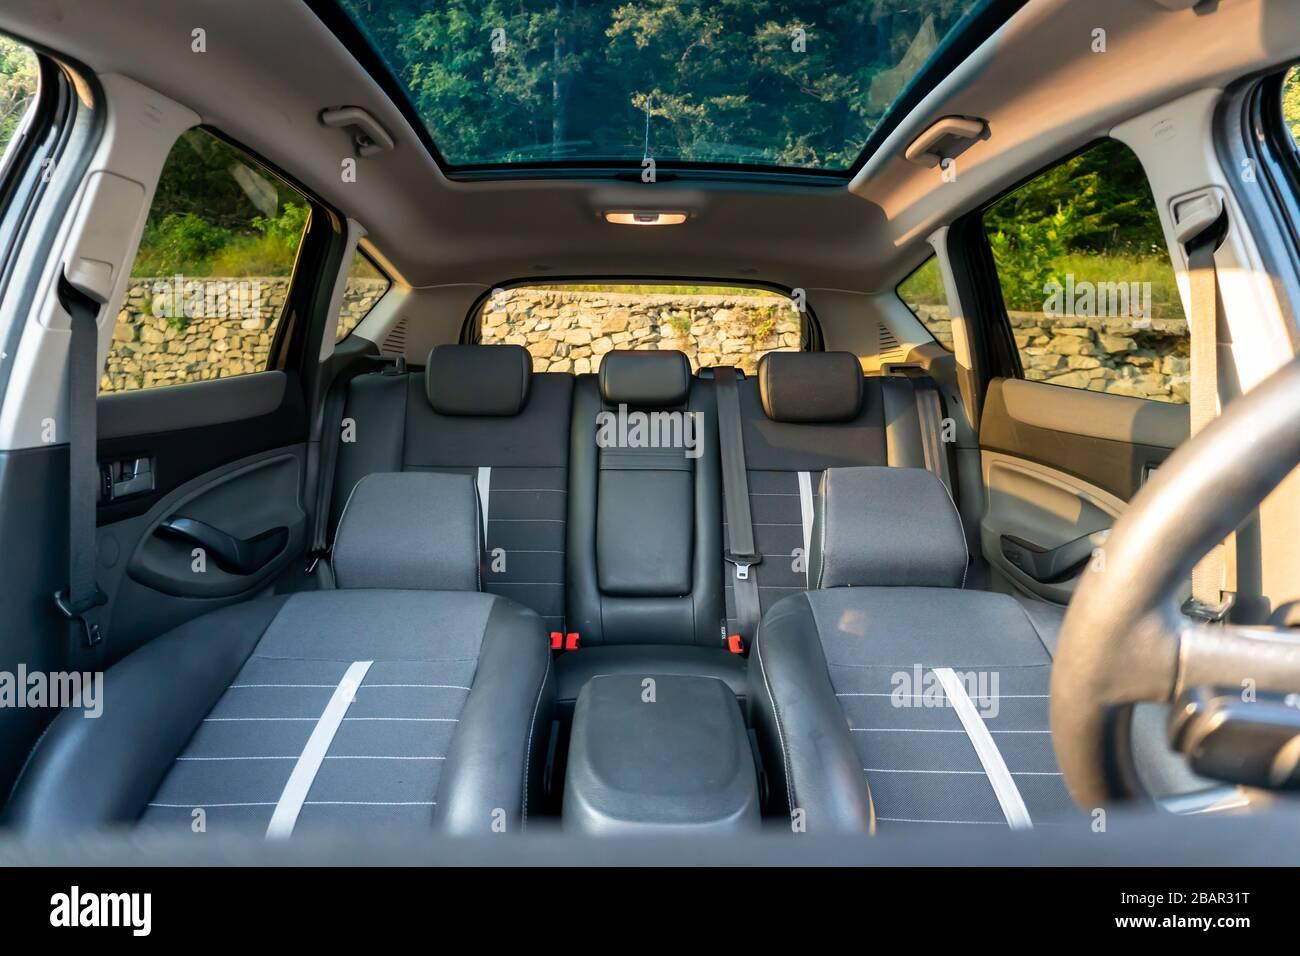 Inside detailed photo of wonderful SUV with panoramic glazed dach/sunroof Stock Photo